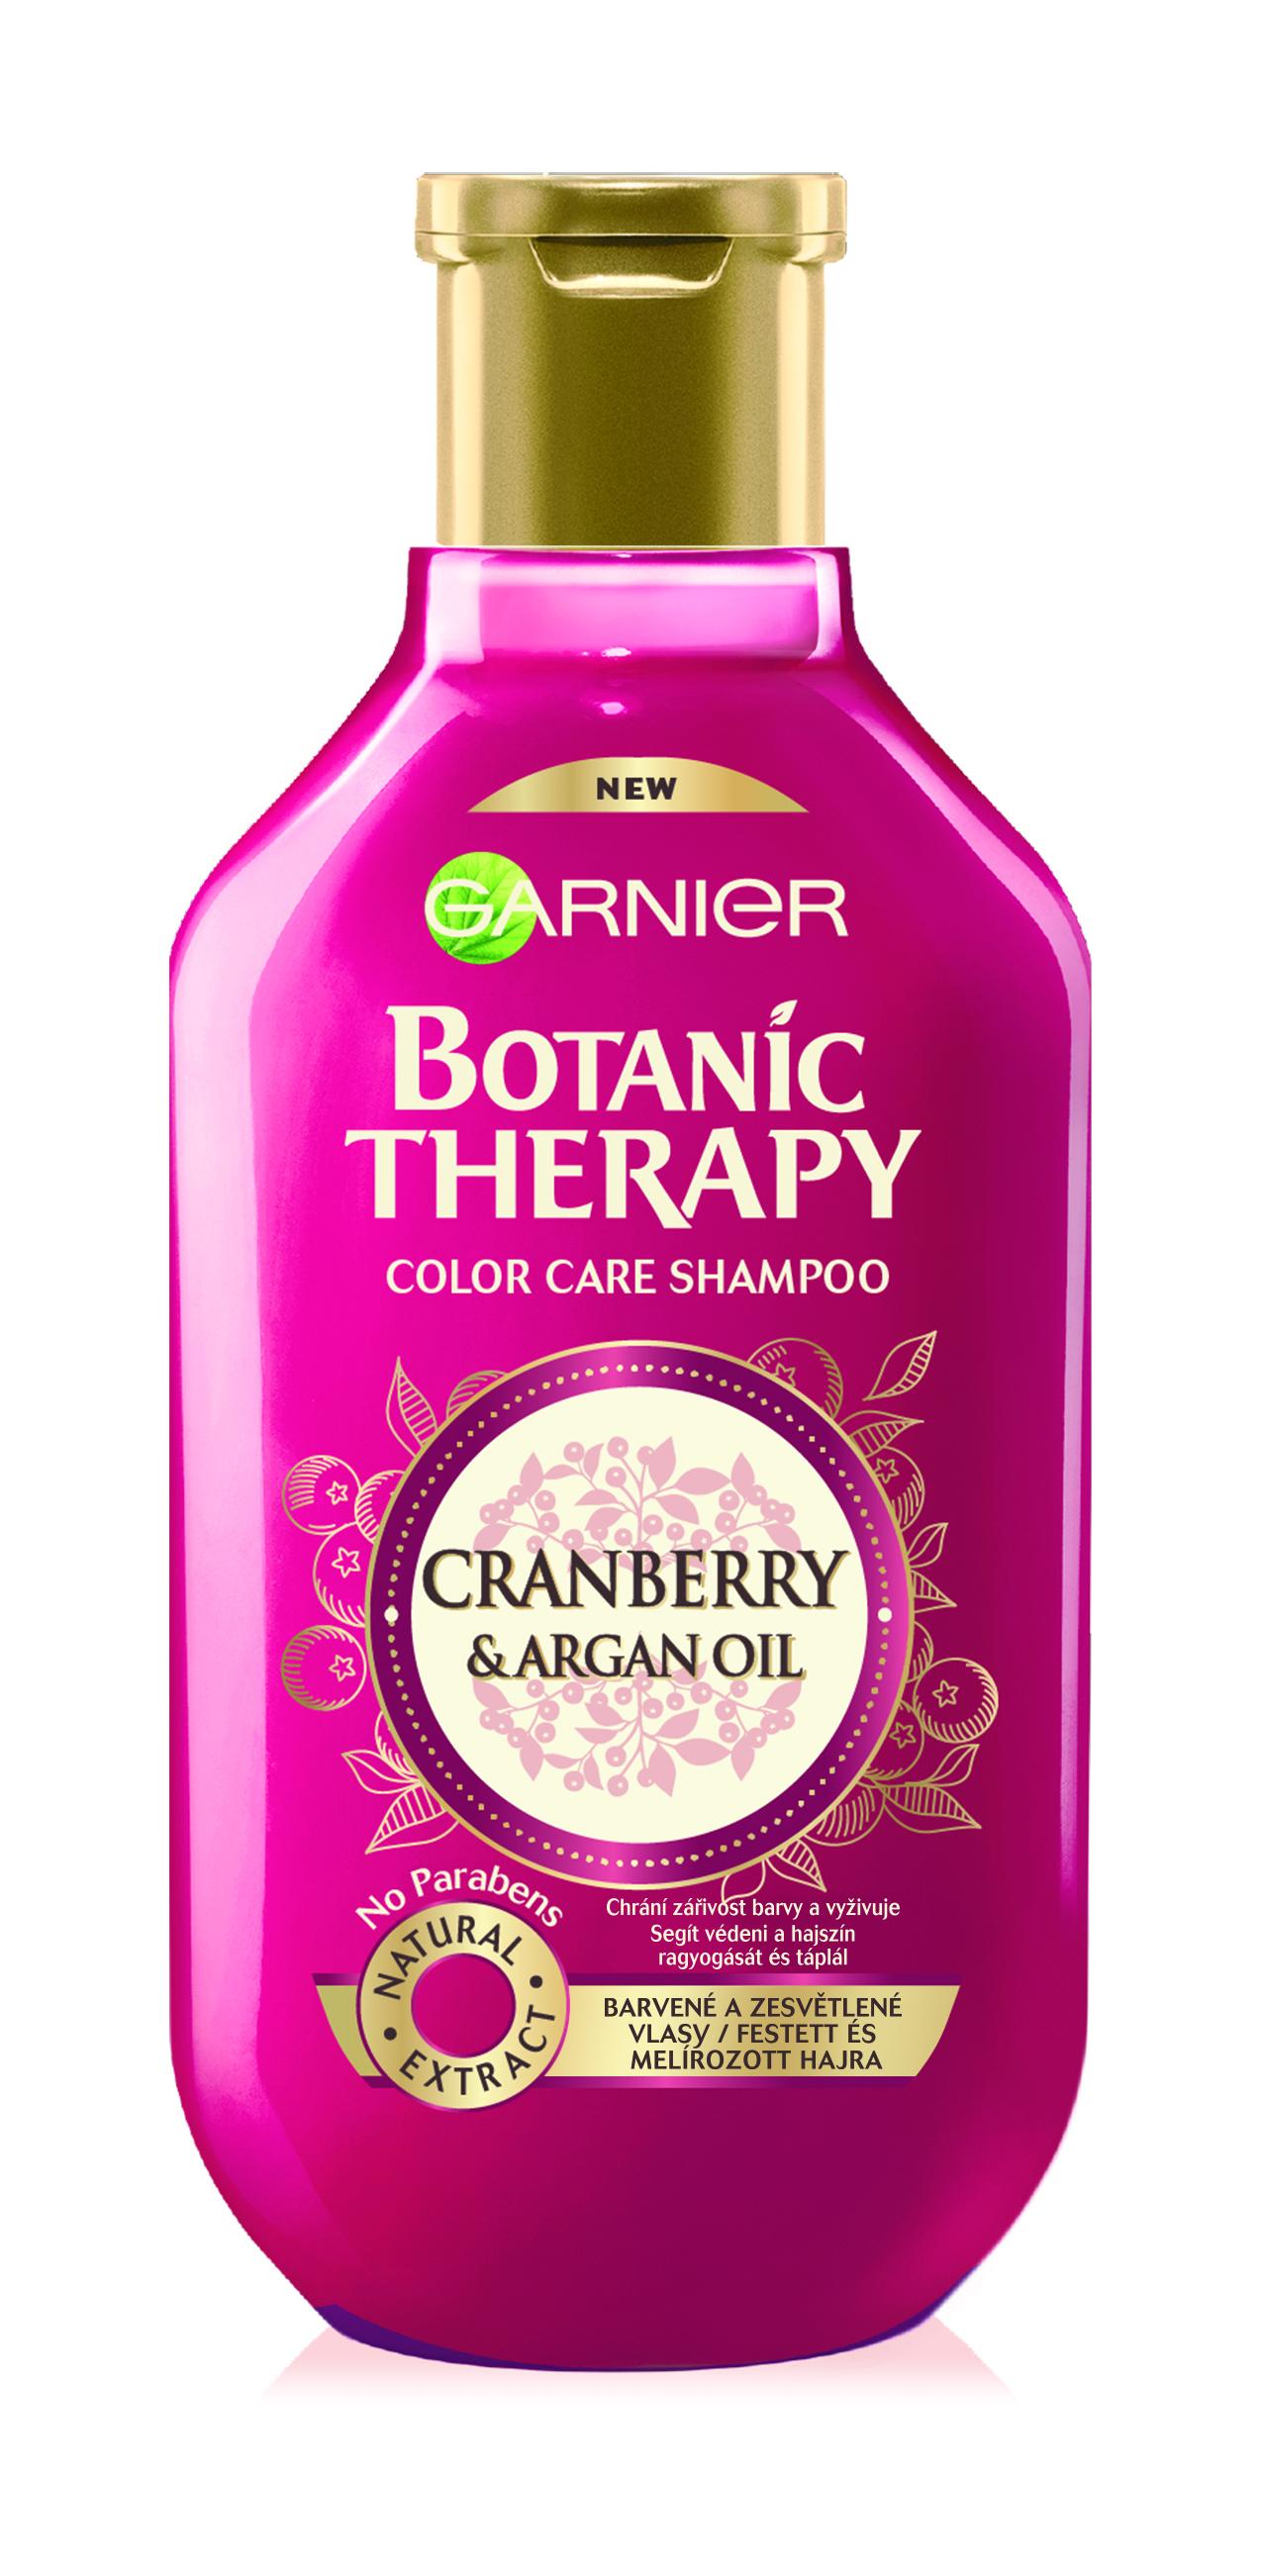 Garnier Botanic Therapy Cranberry & Argan oil šampon 250 ml